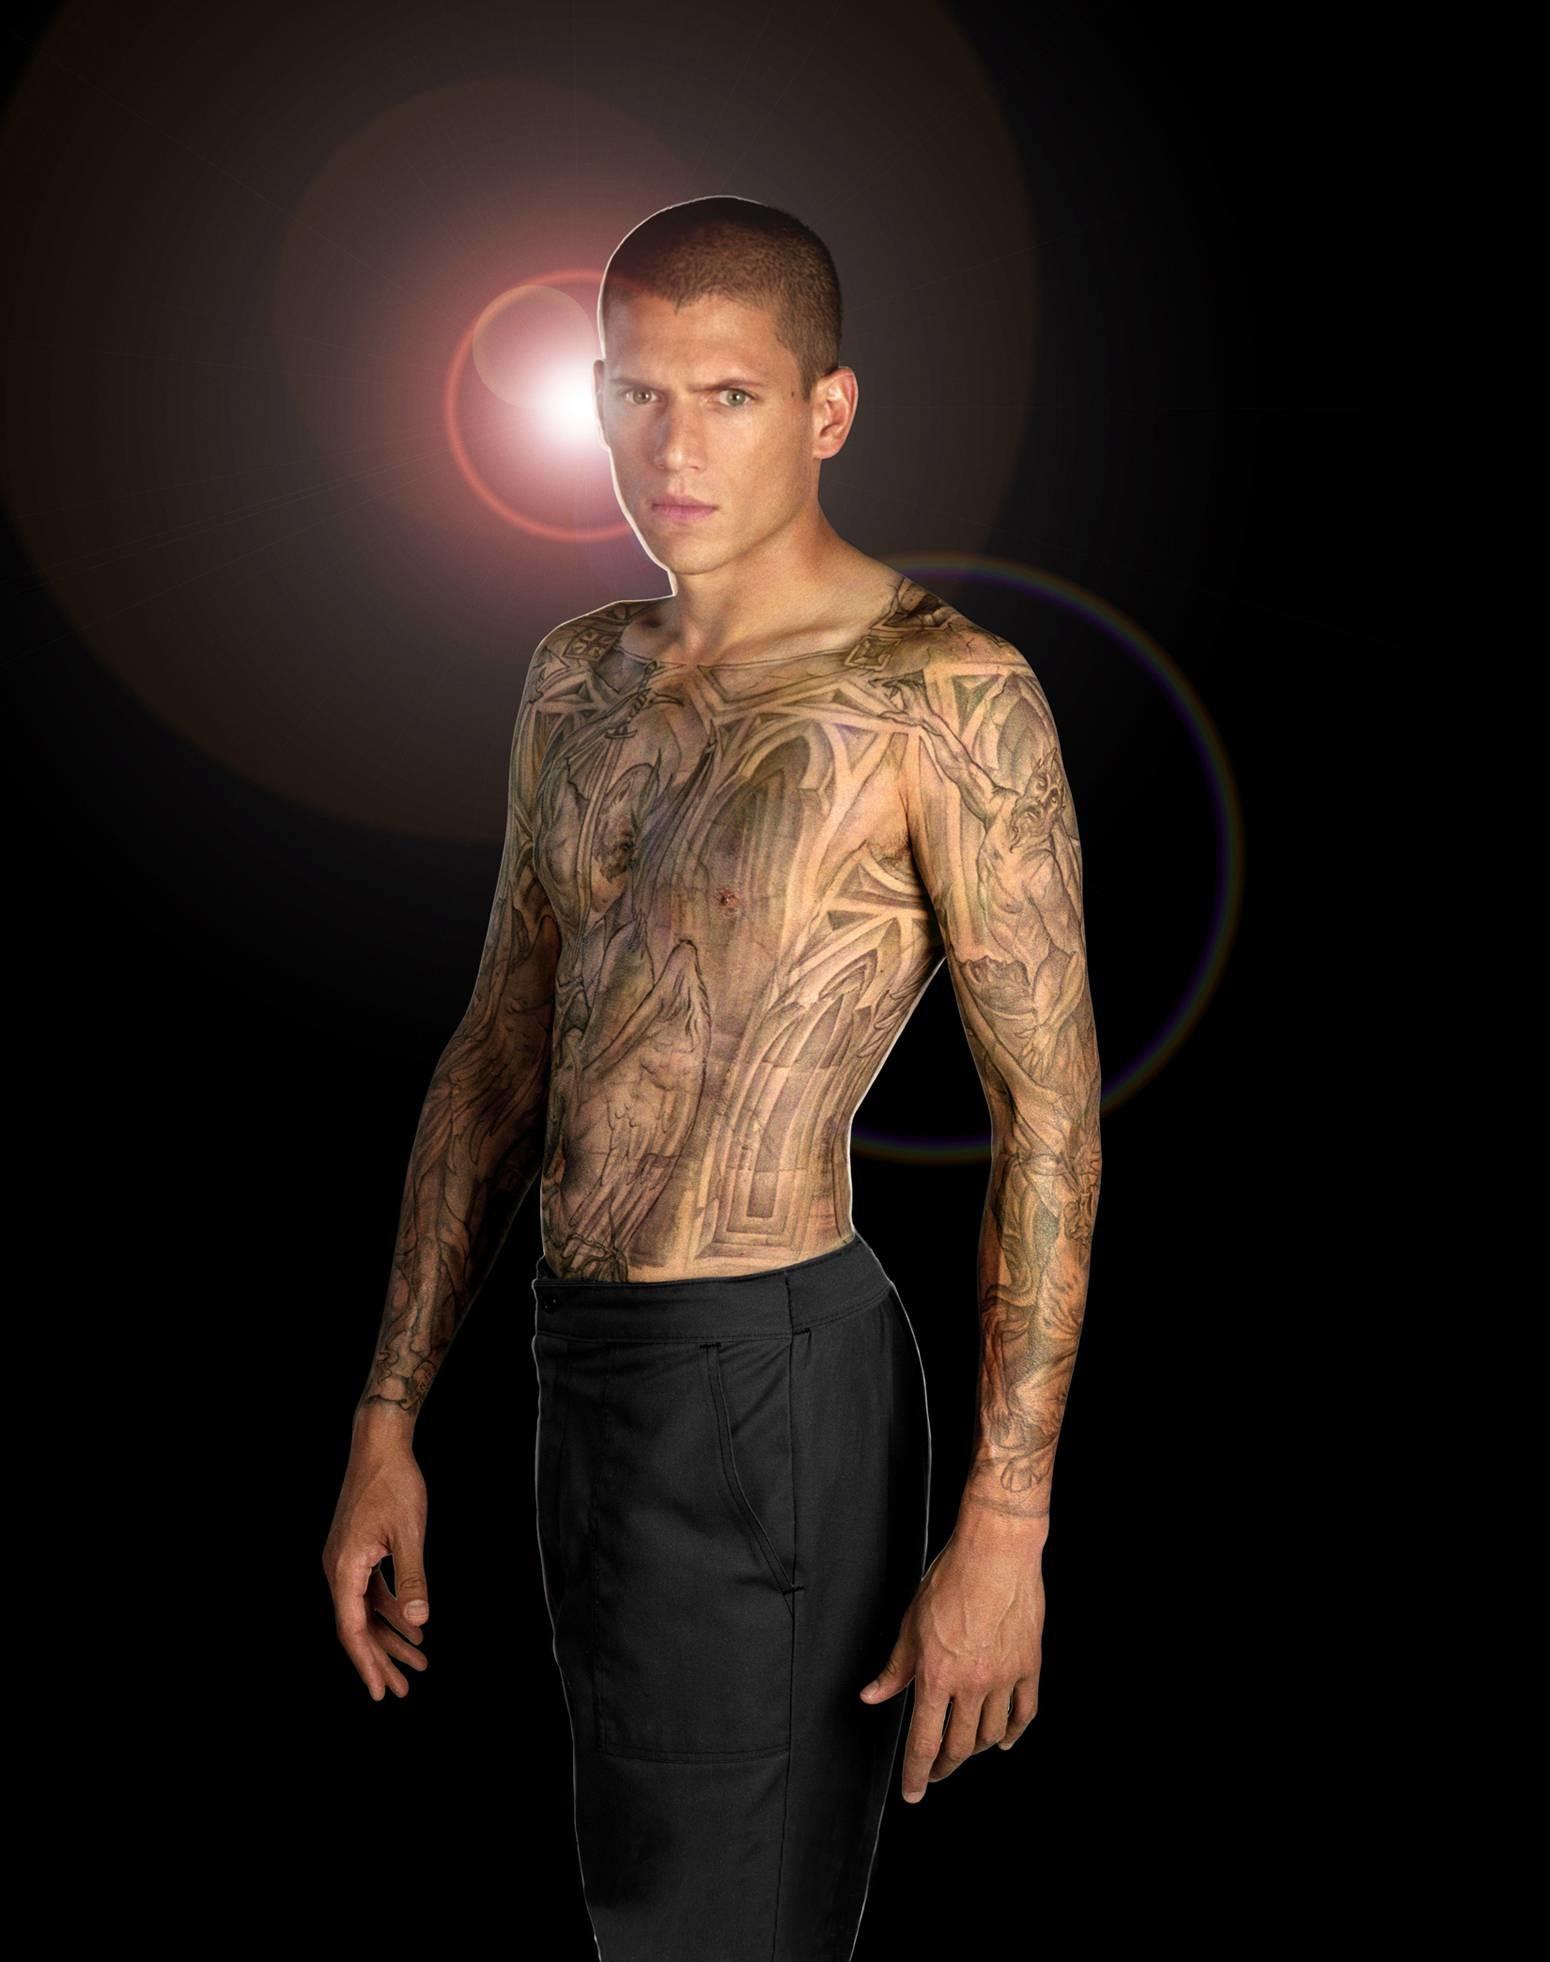 Tattoos wentworth miller prison break michael scofield wallpaper .